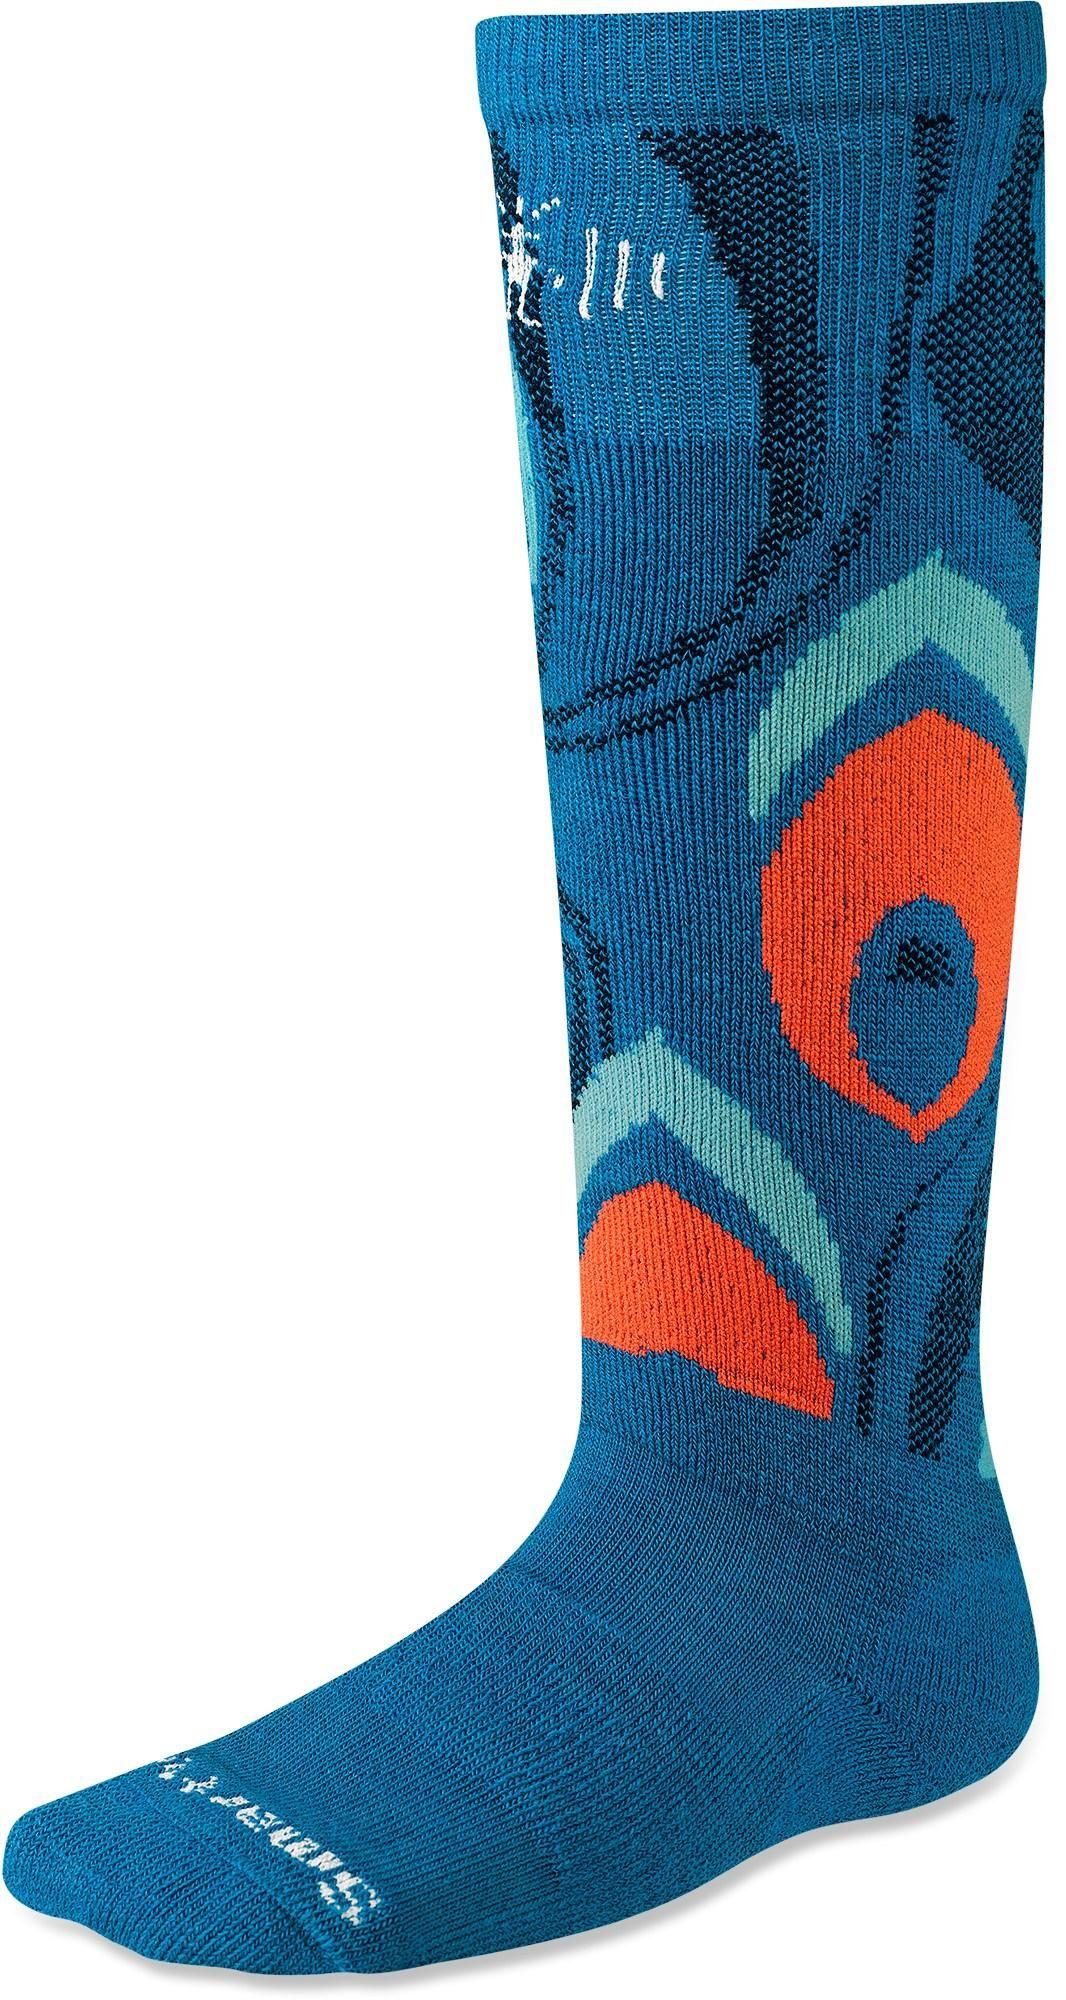 Smartwool Wintersport Feather Socks Girls 2012 Closeout Girls Socks Socks Ski Socks